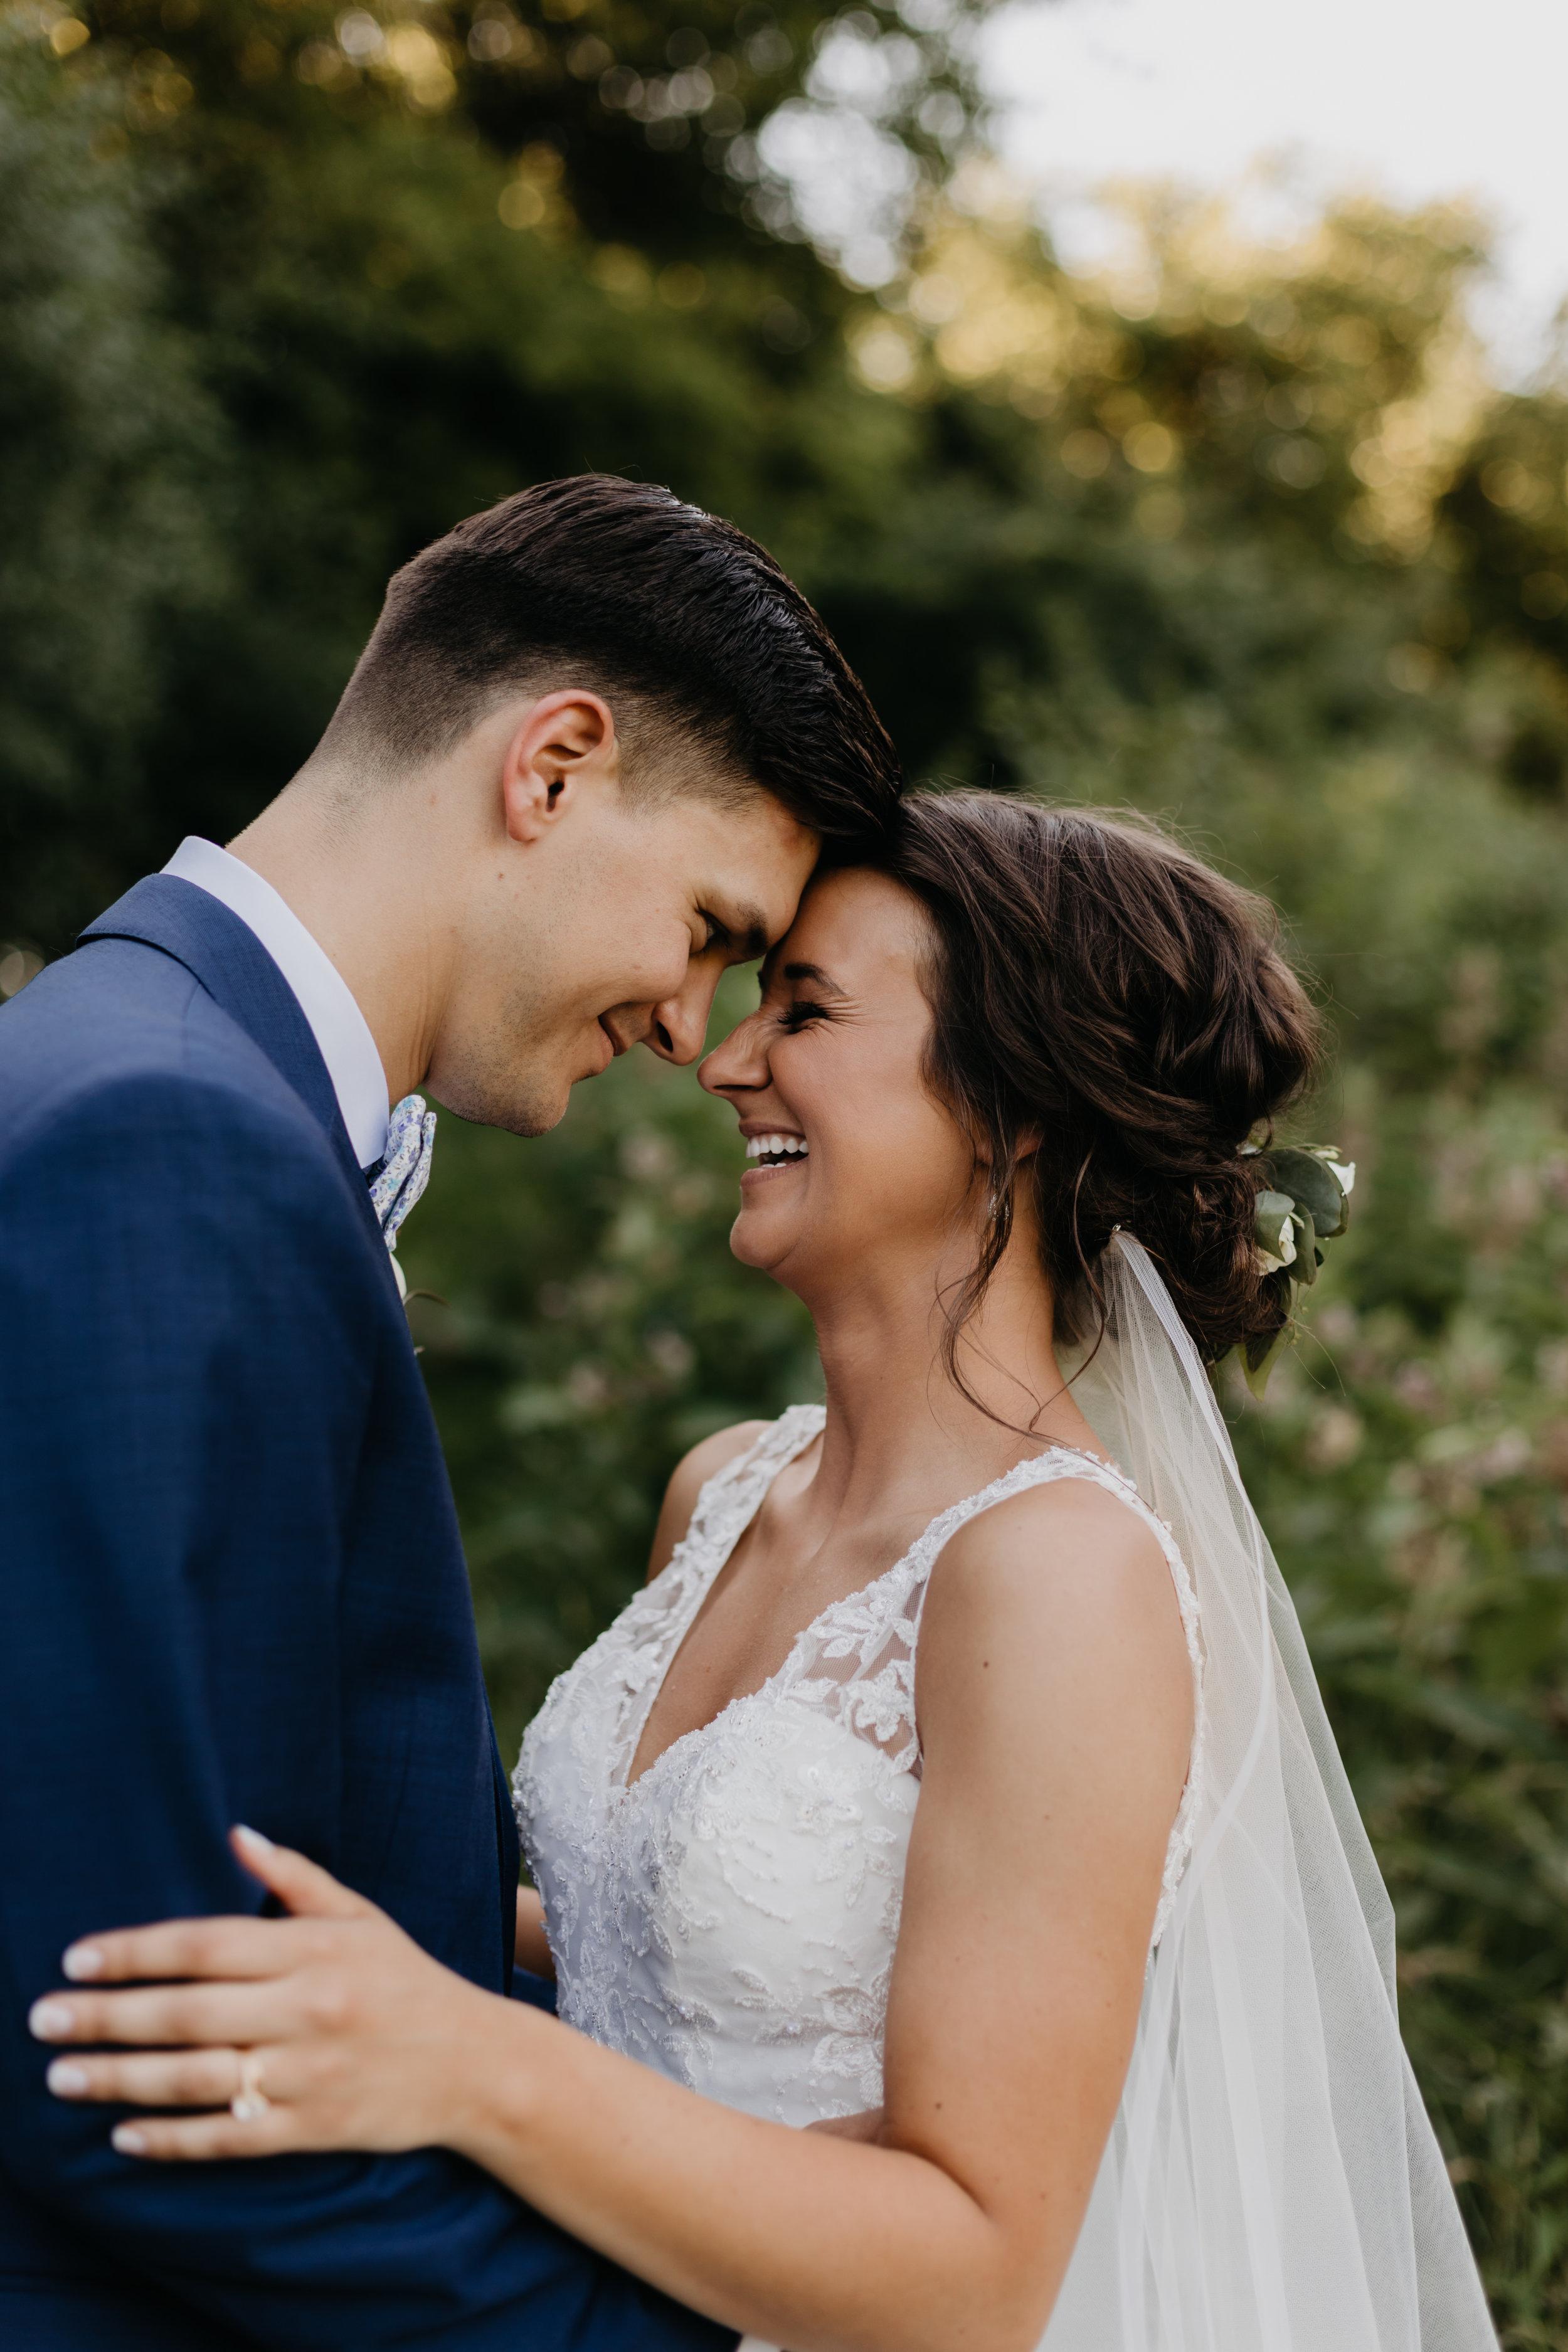 Allie + Nick - sweet + natural outdoor wedding